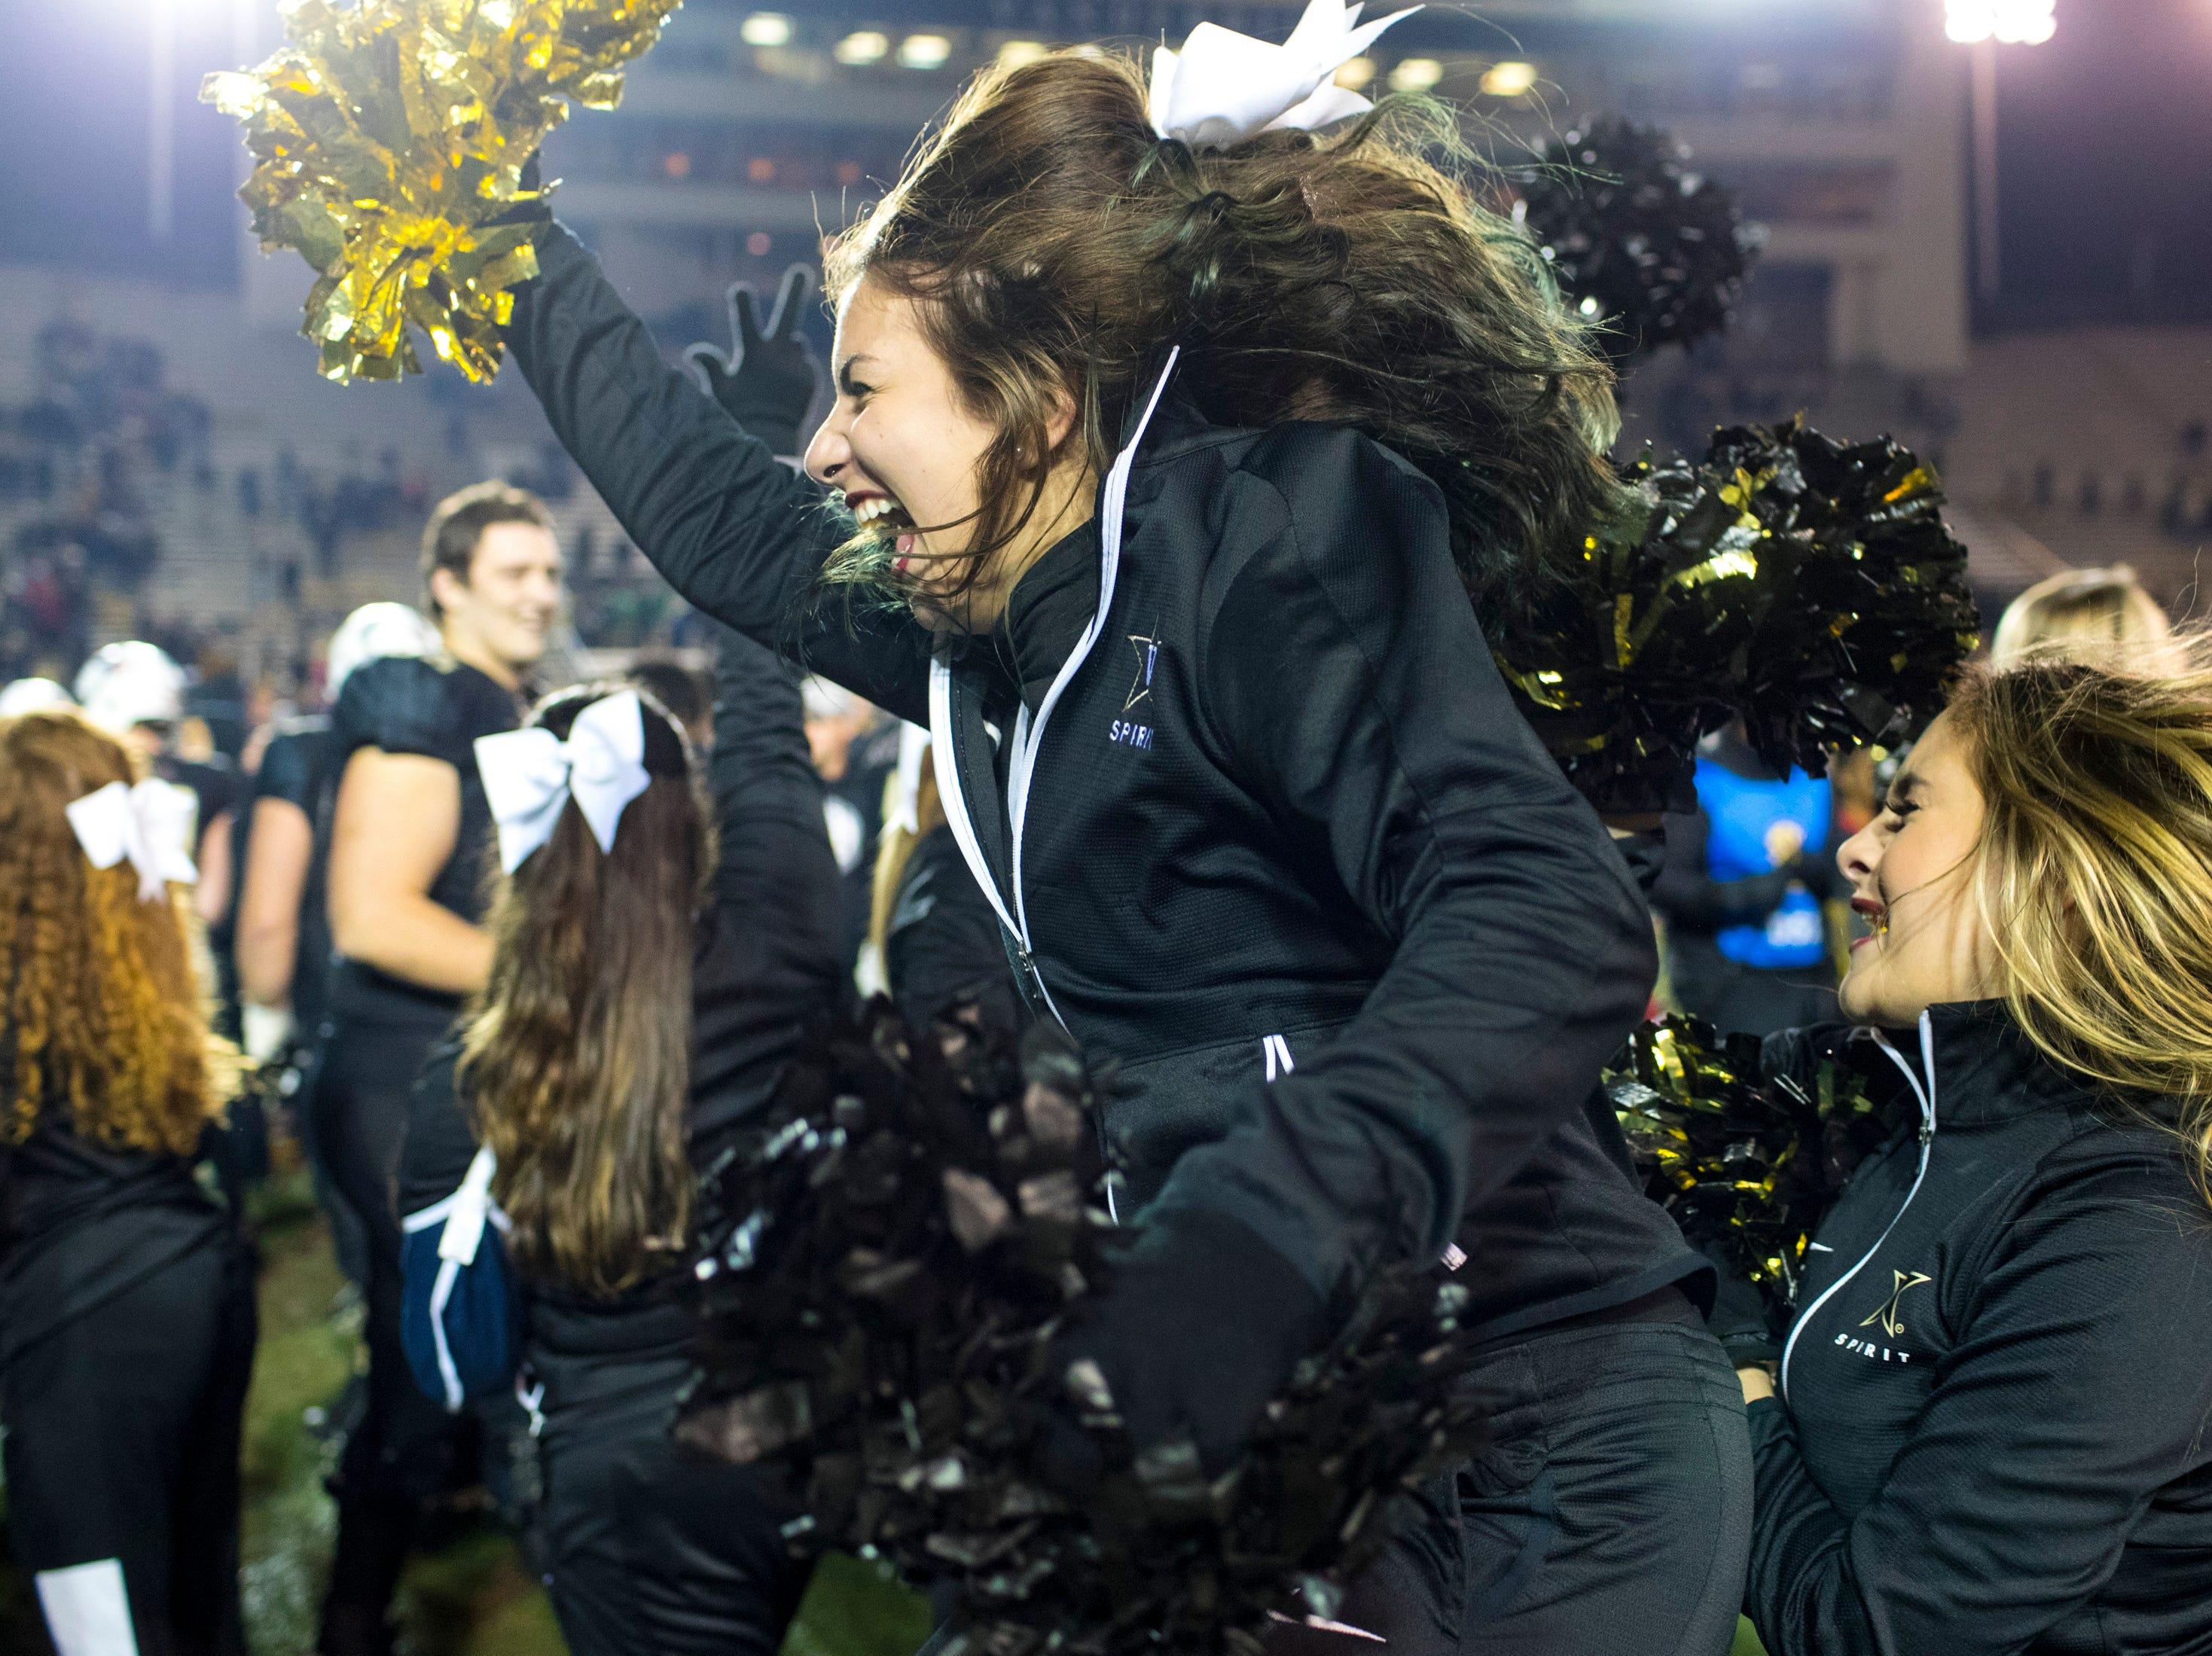 Vanderbilt's cheerleaders celebrate after Vanderbilt's game against Ole Miss at Vanderbilt Stadium in Nashville on Saturday, Nov. 17, 2018.